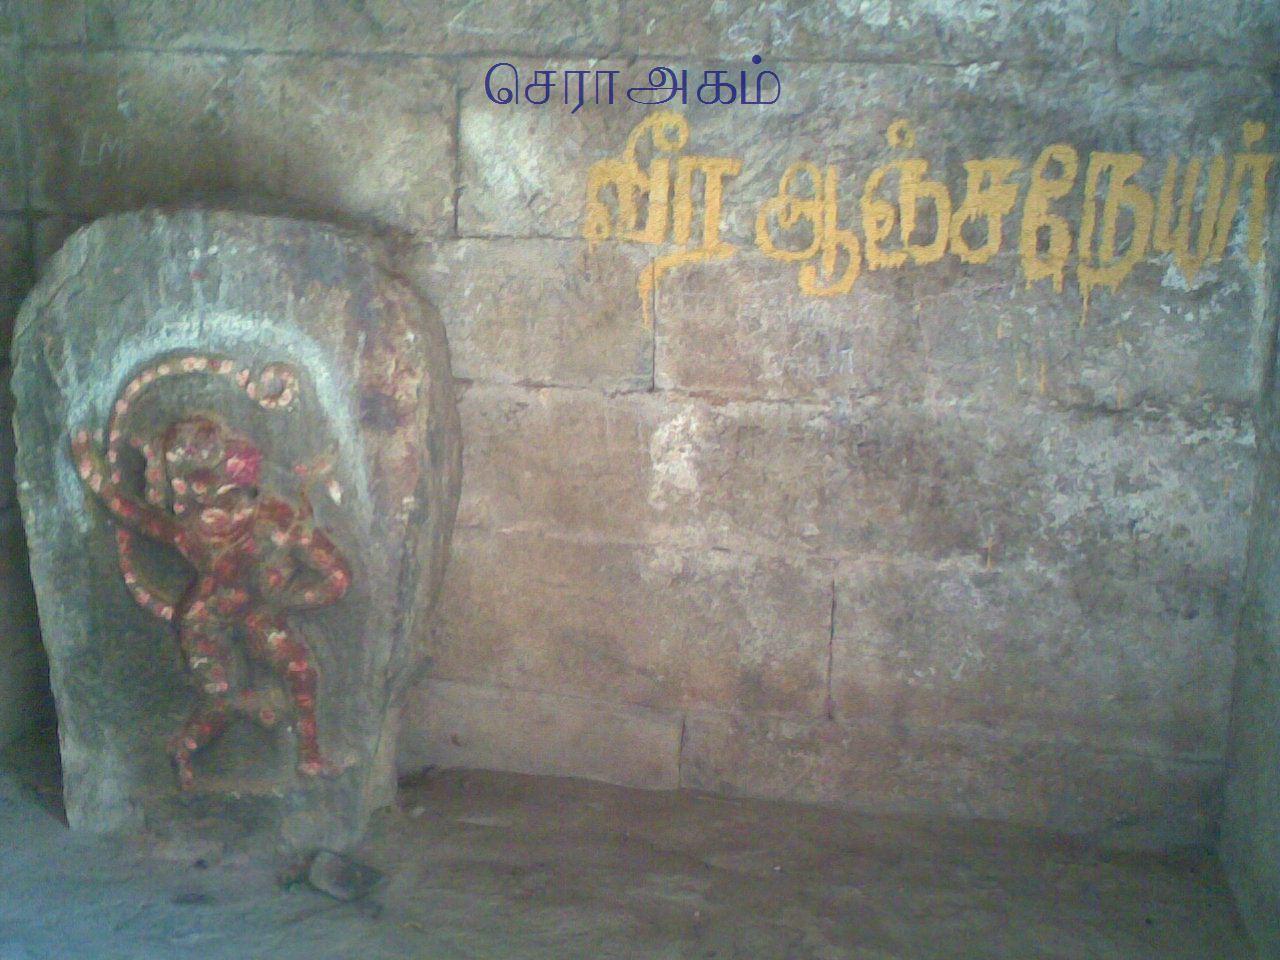 http://1.bp.blogspot.com/-YdnViHtNu1s/ThJa9iXz7II/AAAAAAAAC9Q/FnpqFD40QFY/s1600/Image078.jpg